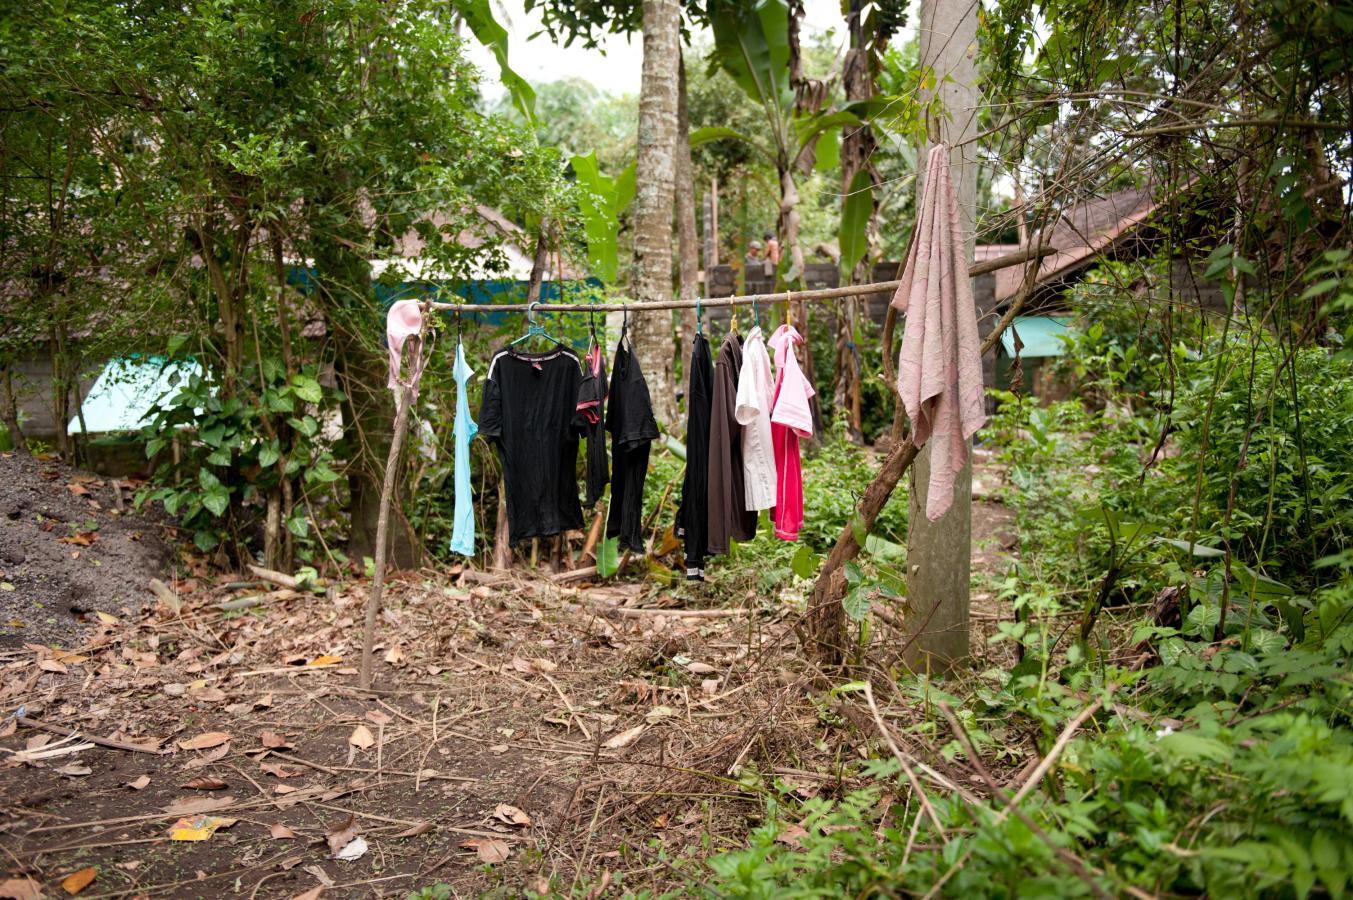 laundry-day-somewhere-around-sidemen-bali-2010